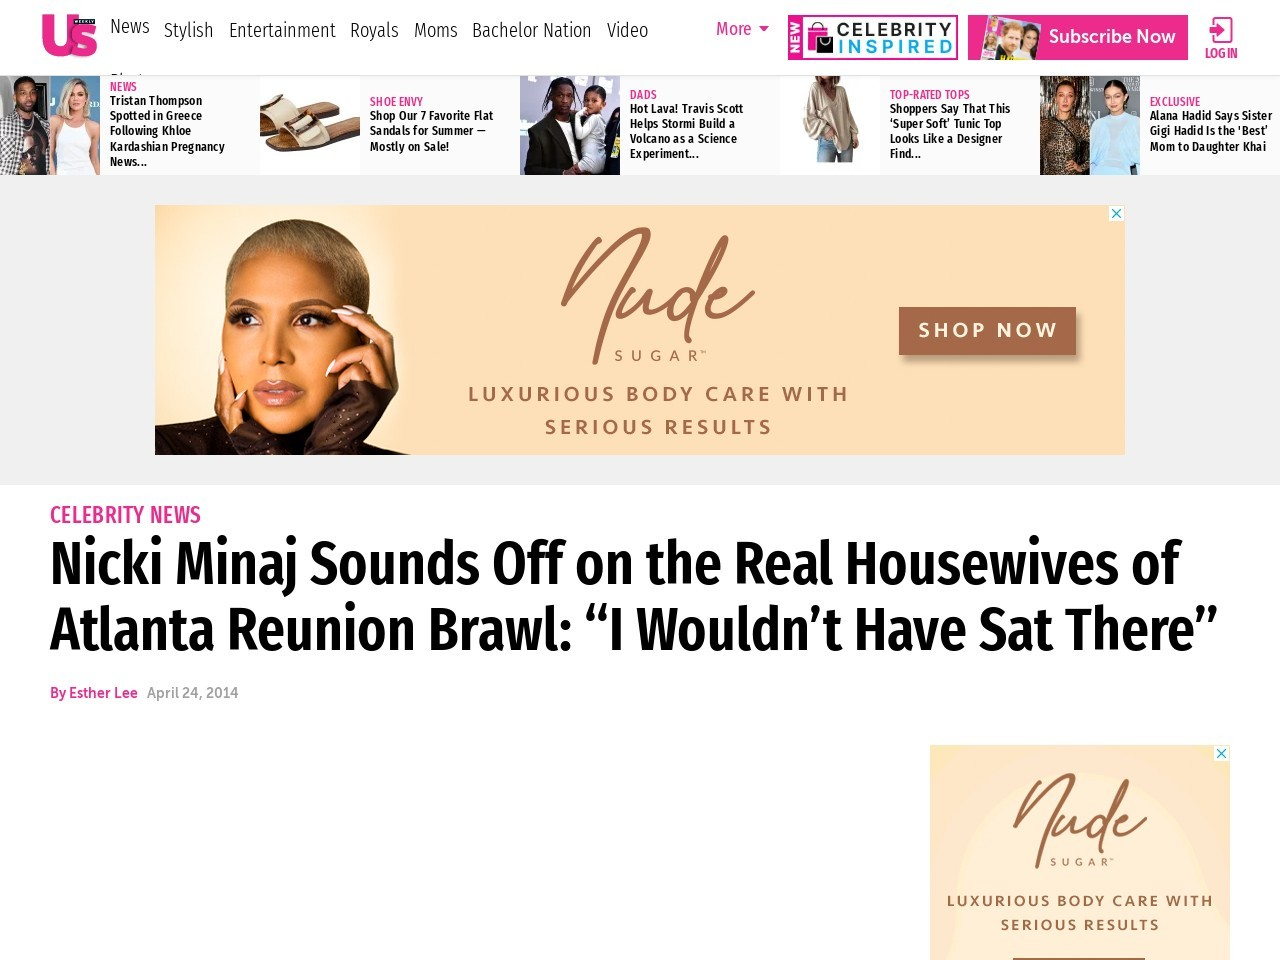 Nicki Minaj Talks Real Housewives of Atlanta Reunion Brawl